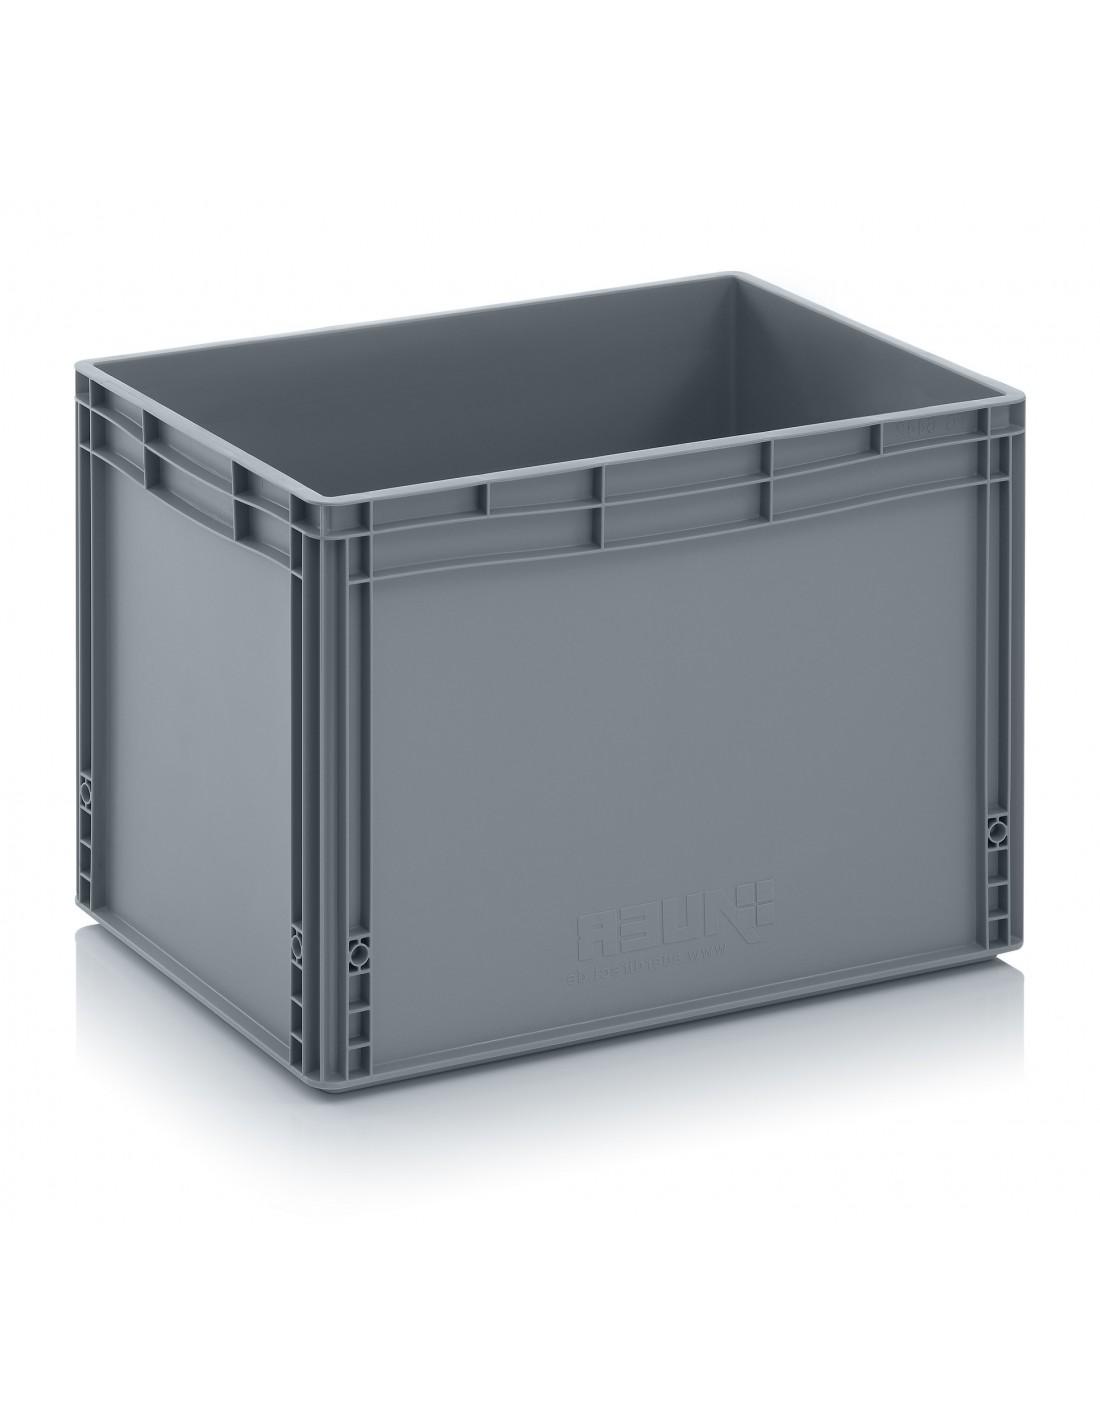 600 x 400 x 420 mm Eurobehälter